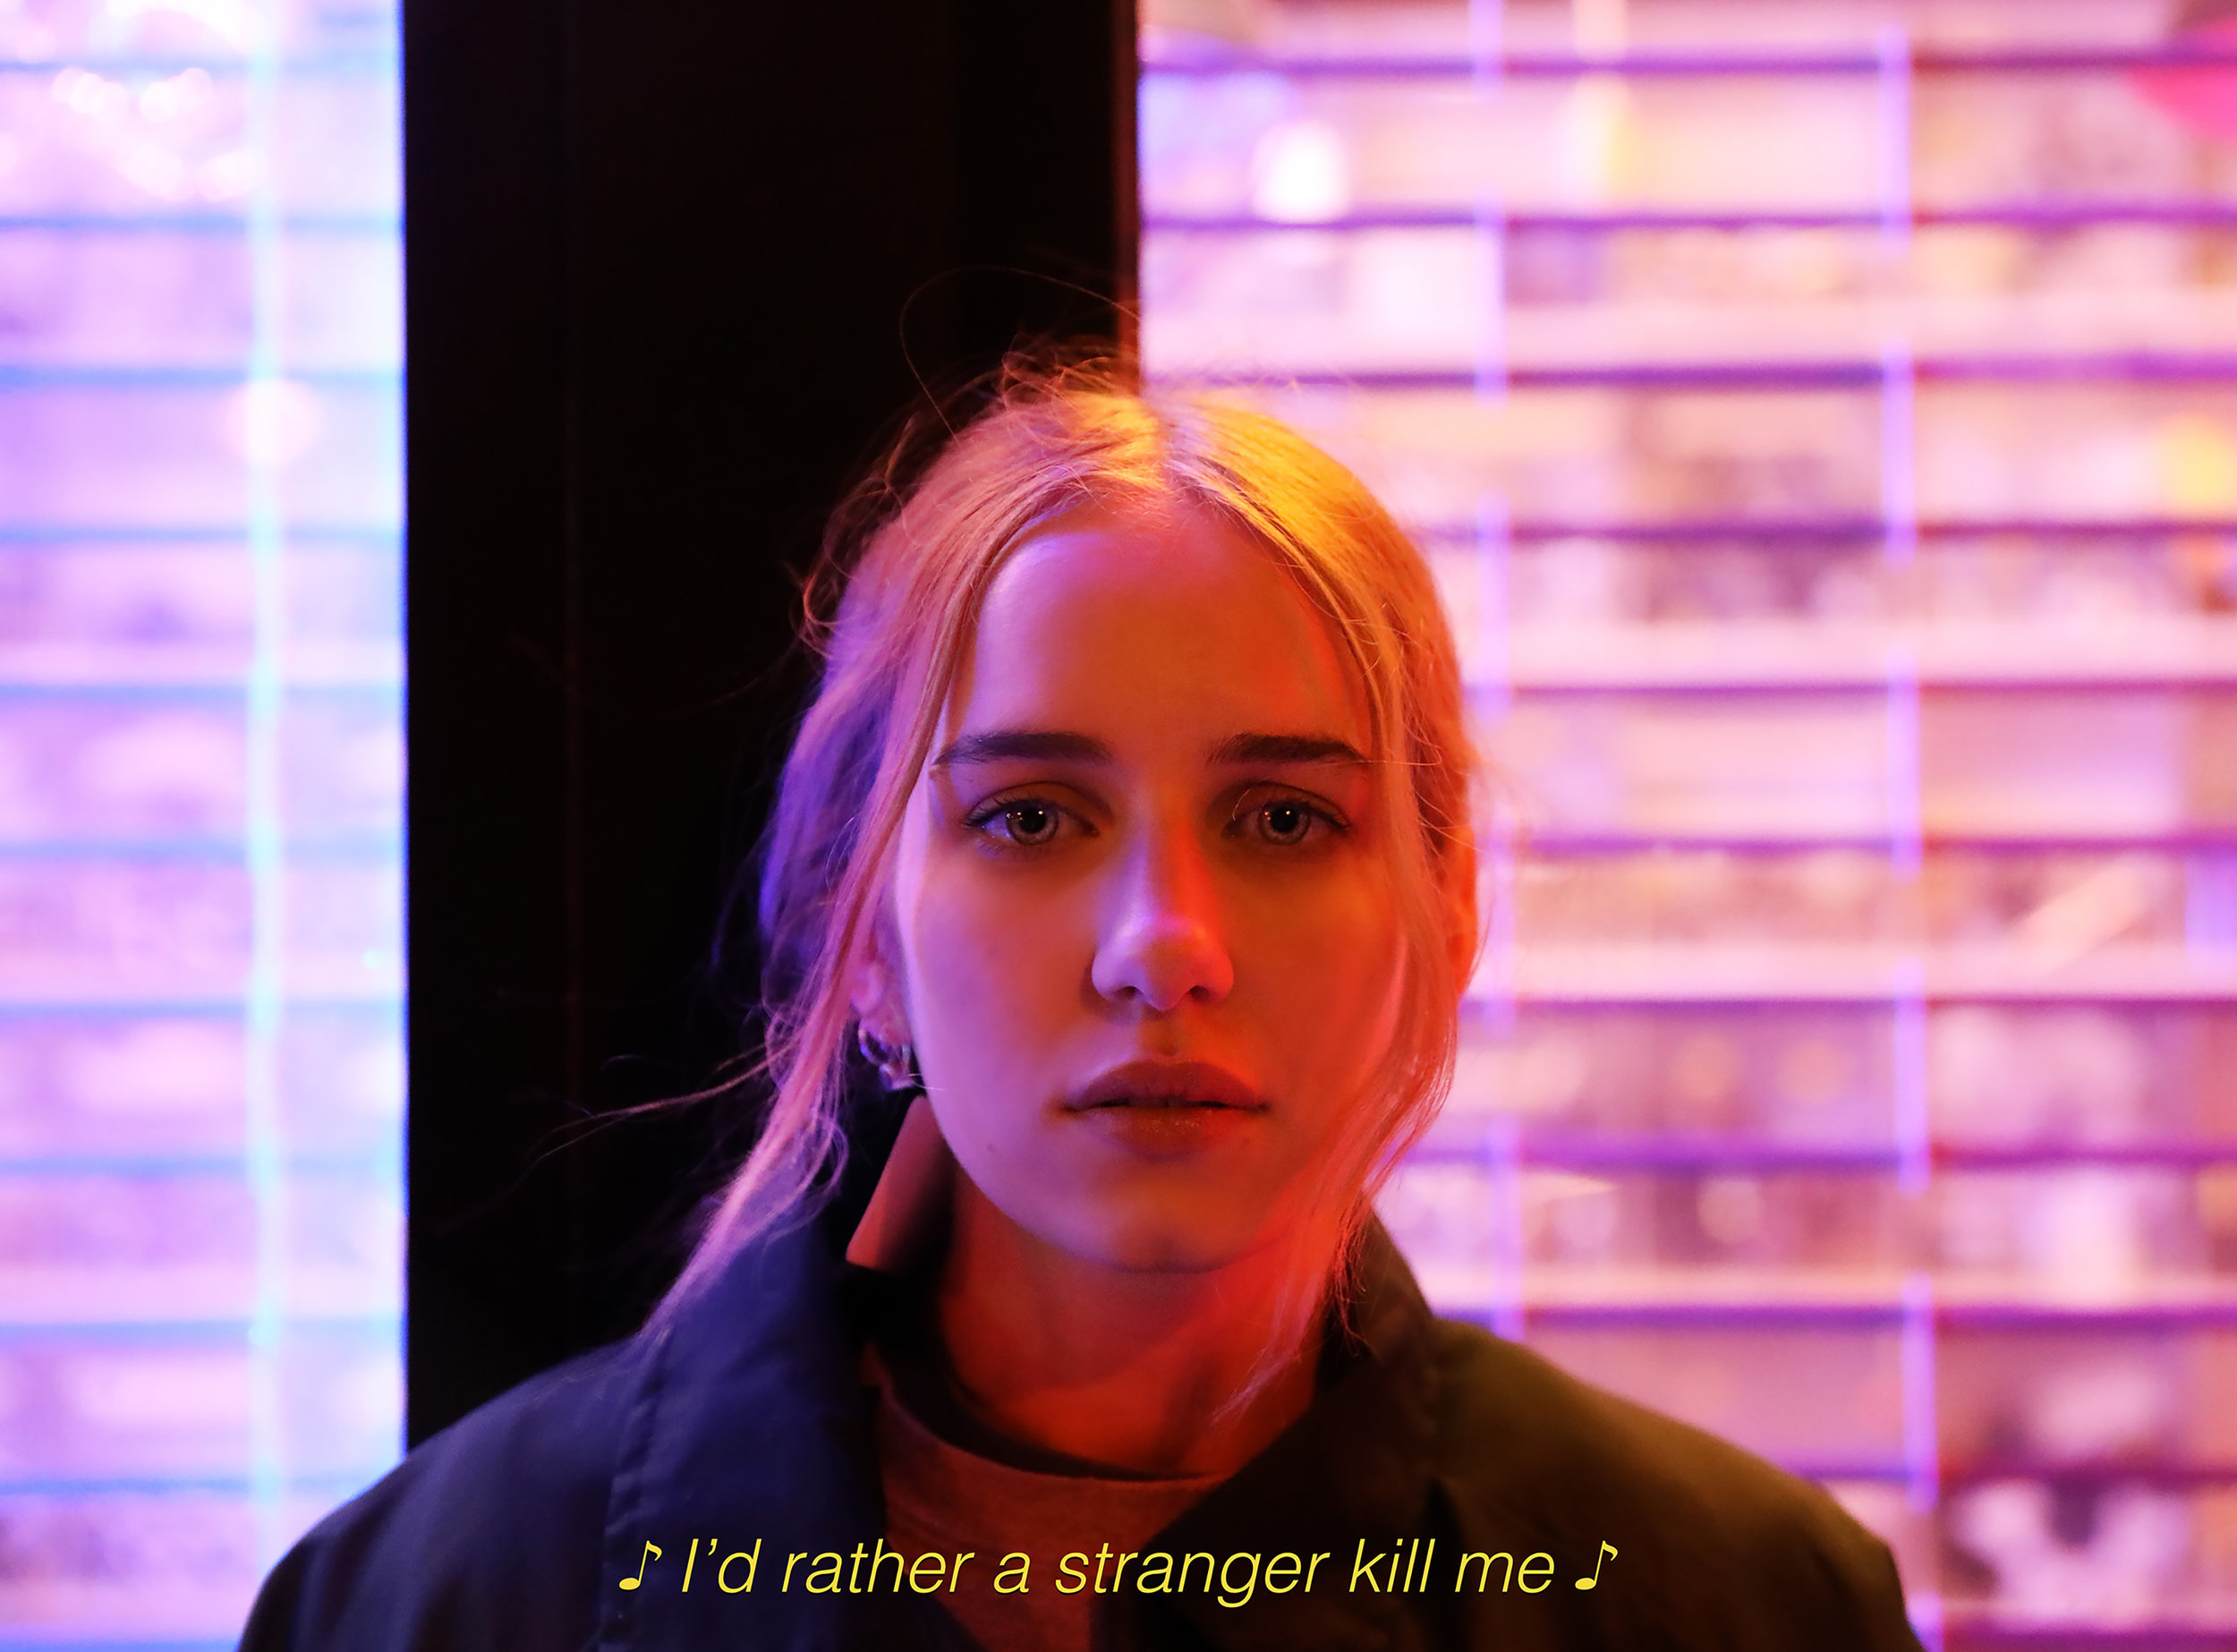 becoming the stranger